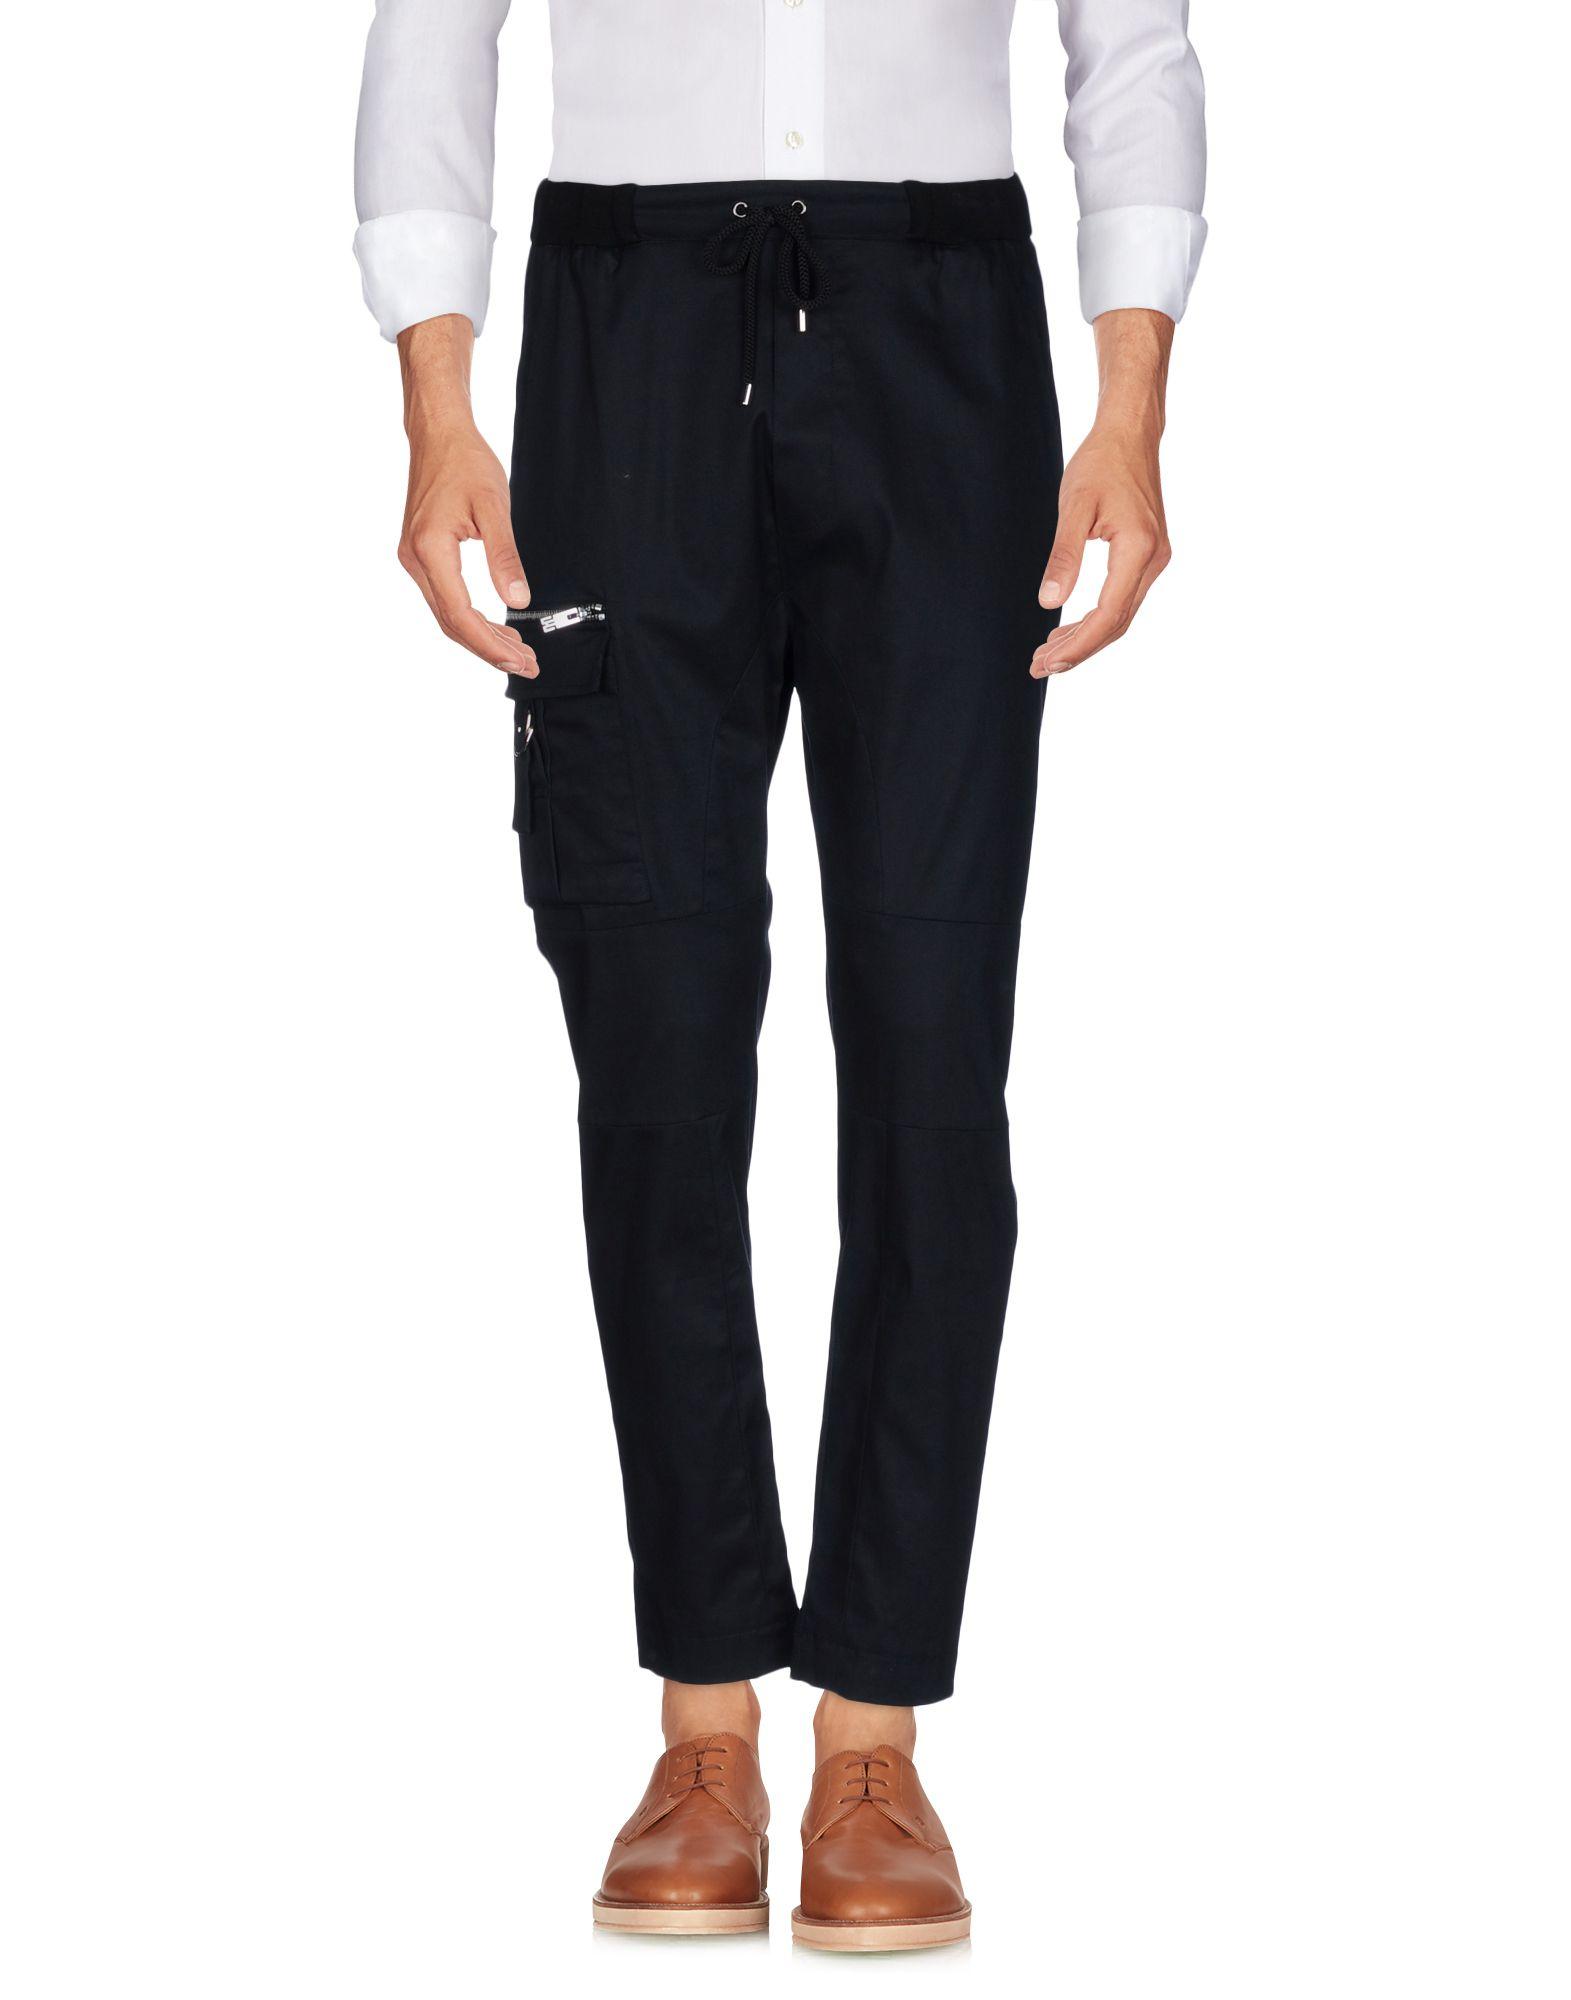 Pantalone Urban Les Hommes Uomo - Acquista online su